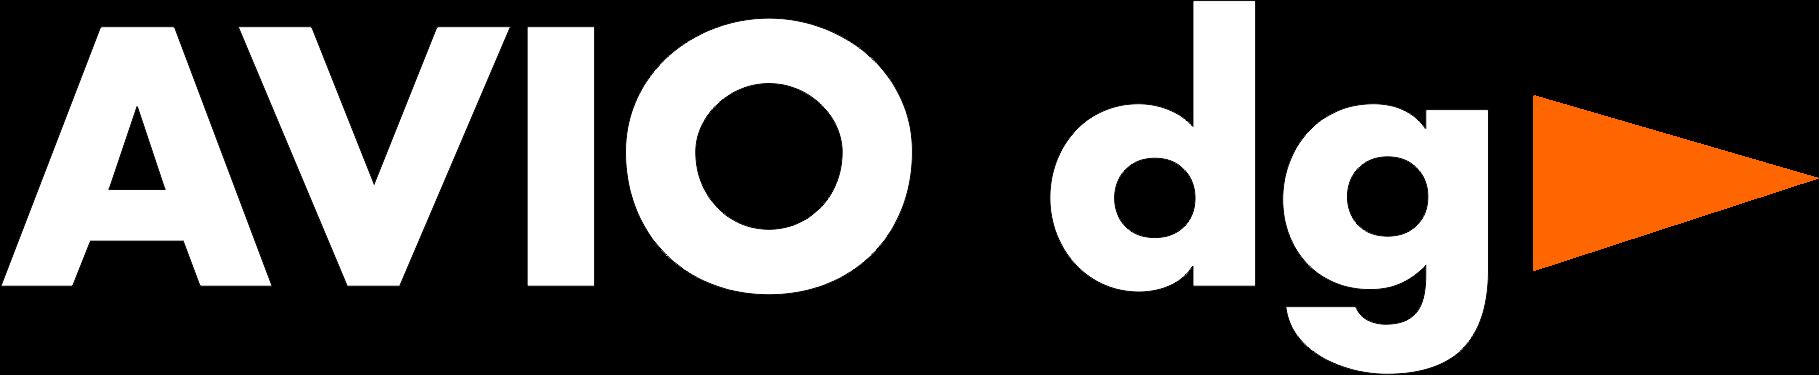 Avio Design Group logo